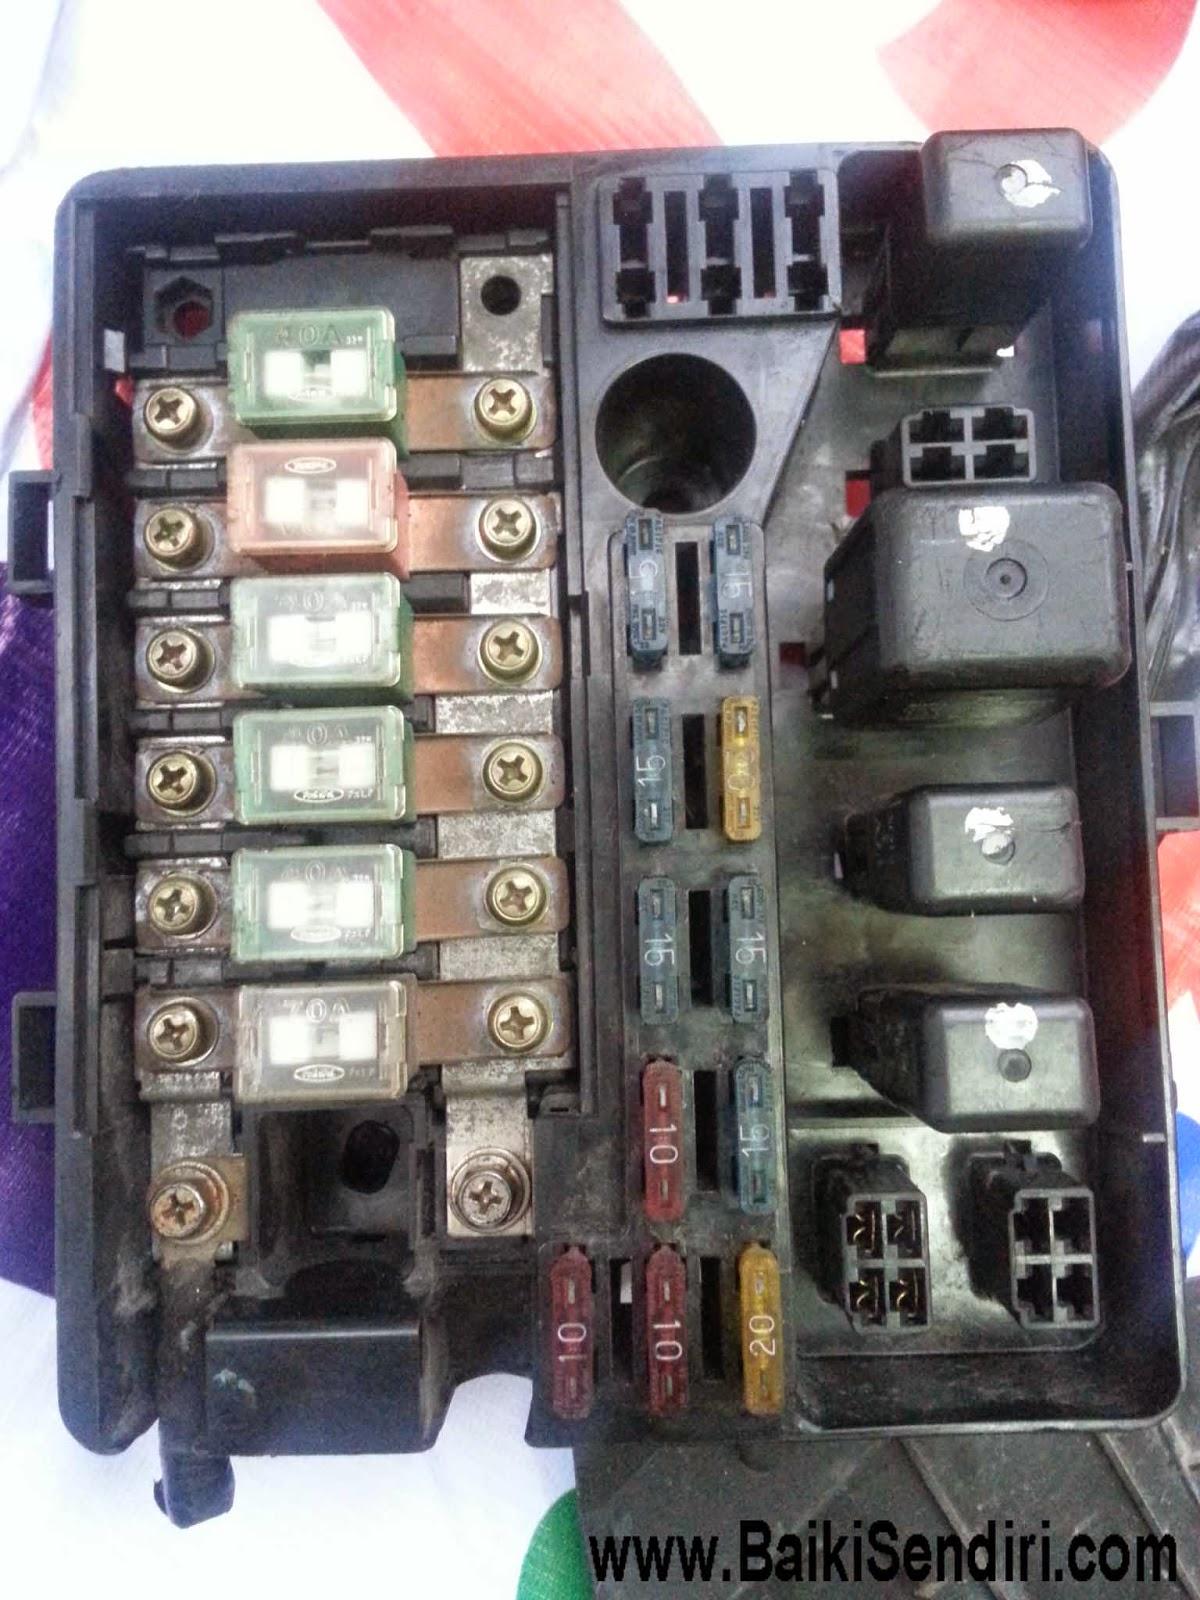 prelude fuse box wiring library honda civic fuse box replacement honda fuse box replacement [ 1200 x 1600 Pixel ]